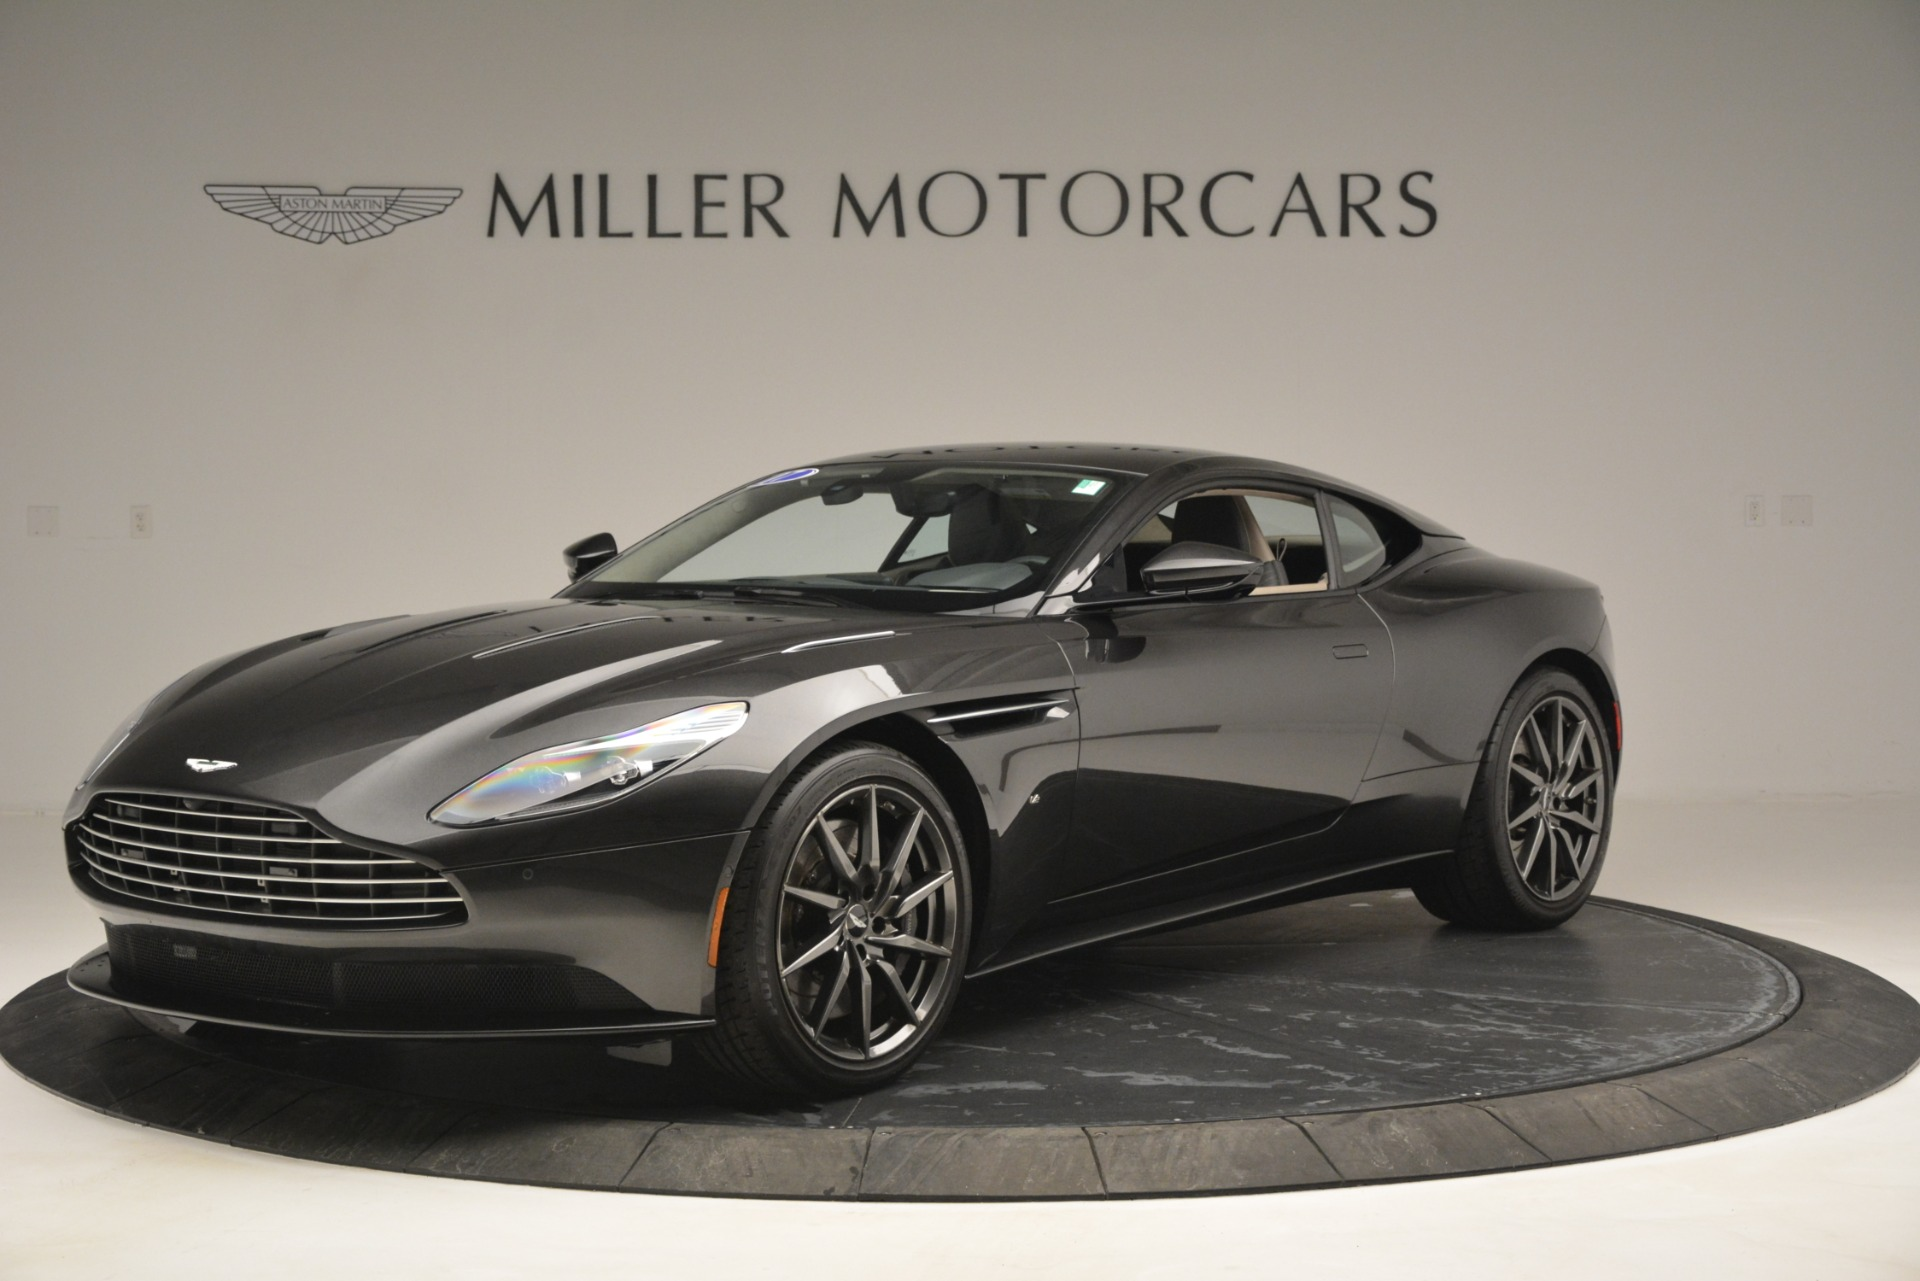 Used 2017 Aston Martin DB11 V12 Coupe for sale Sold at Bugatti of Greenwich in Greenwich CT 06830 1